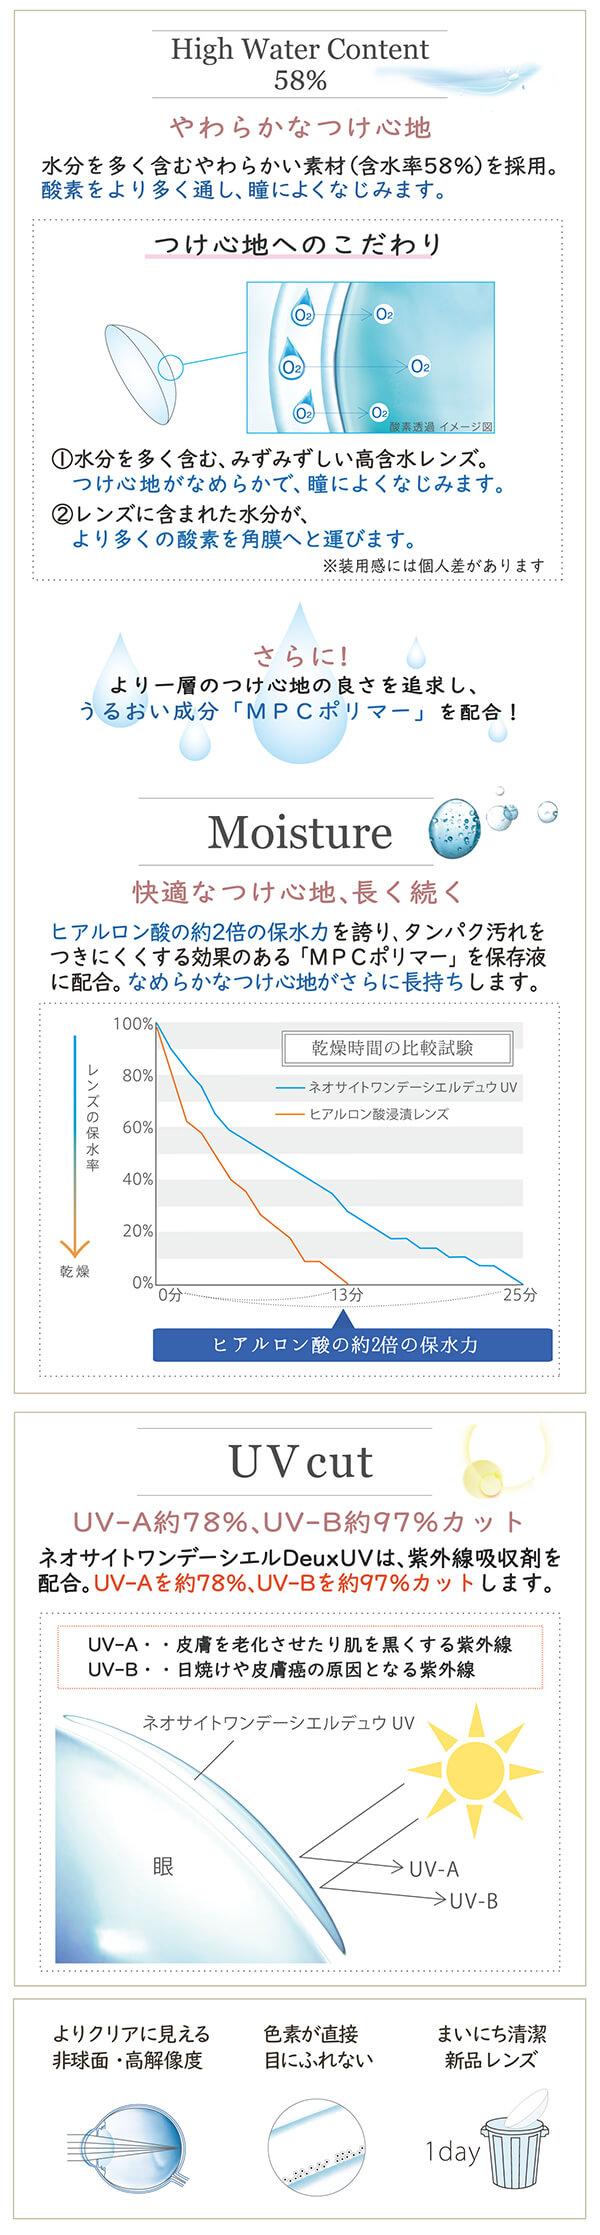 含水率59%、UVcut